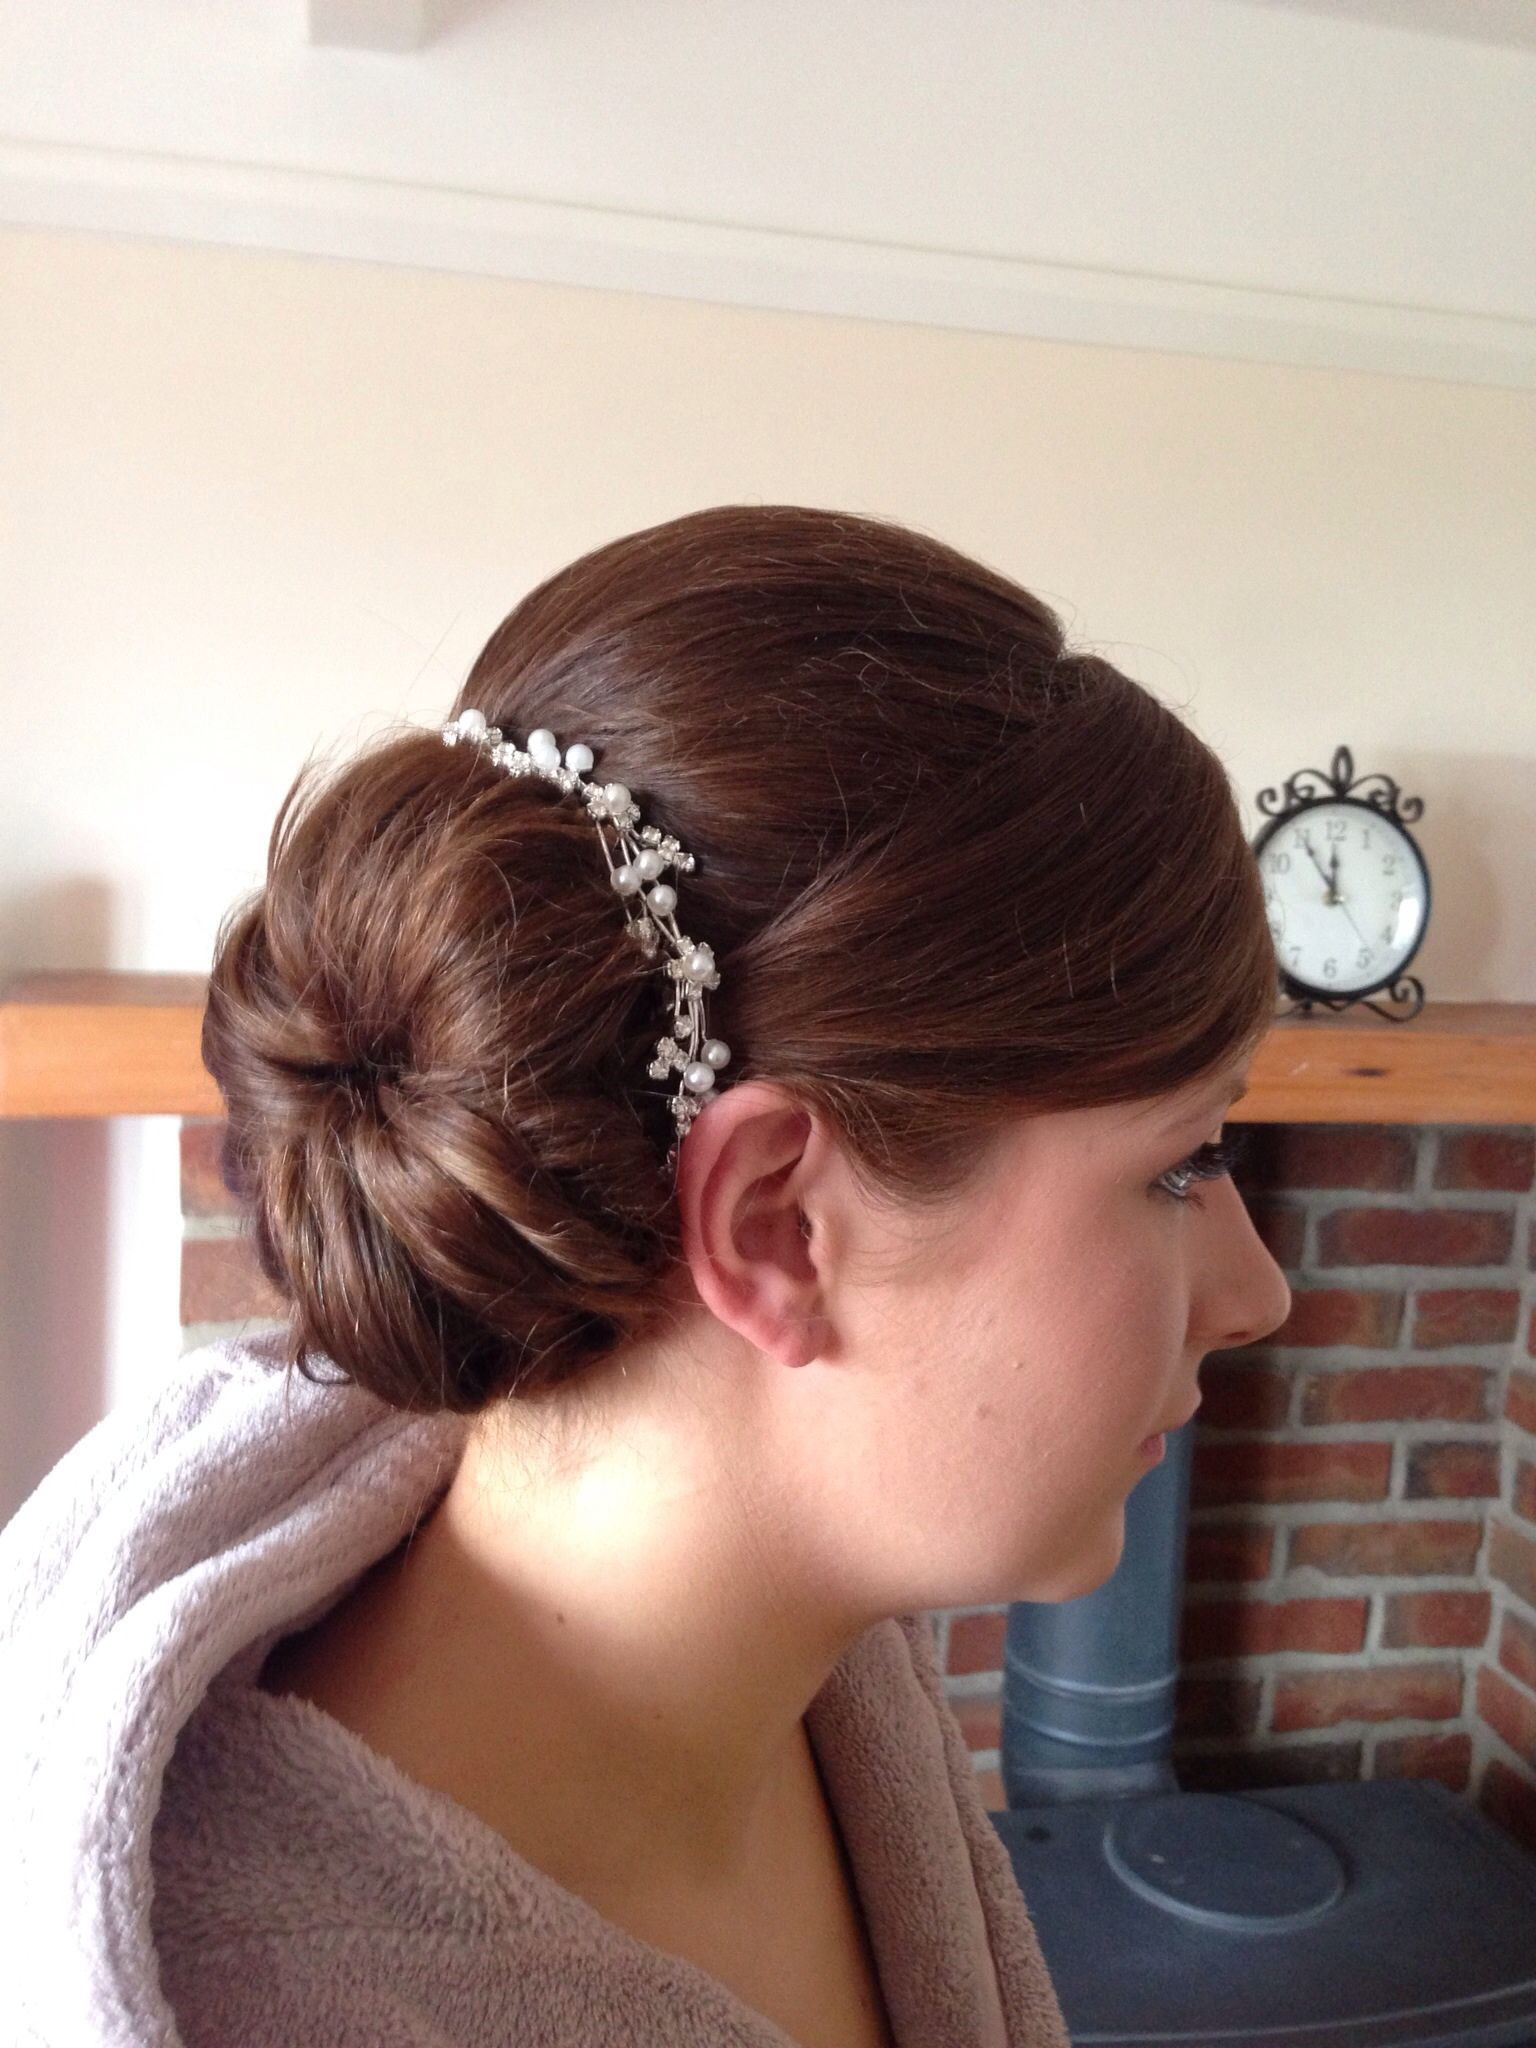 Bridesmaid bun   Up hairstyles, Bridesmaid bun, Hair